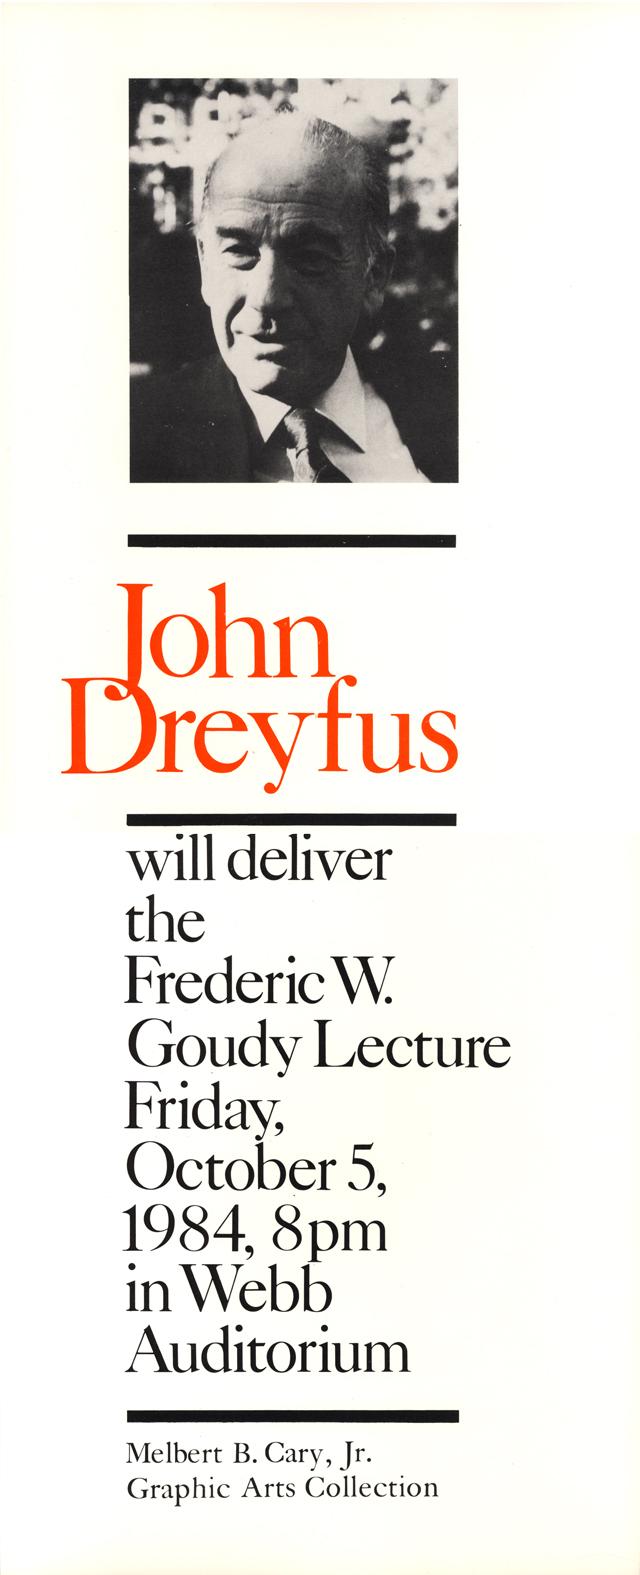 JohnDreyfusGoudyLecturePoster640